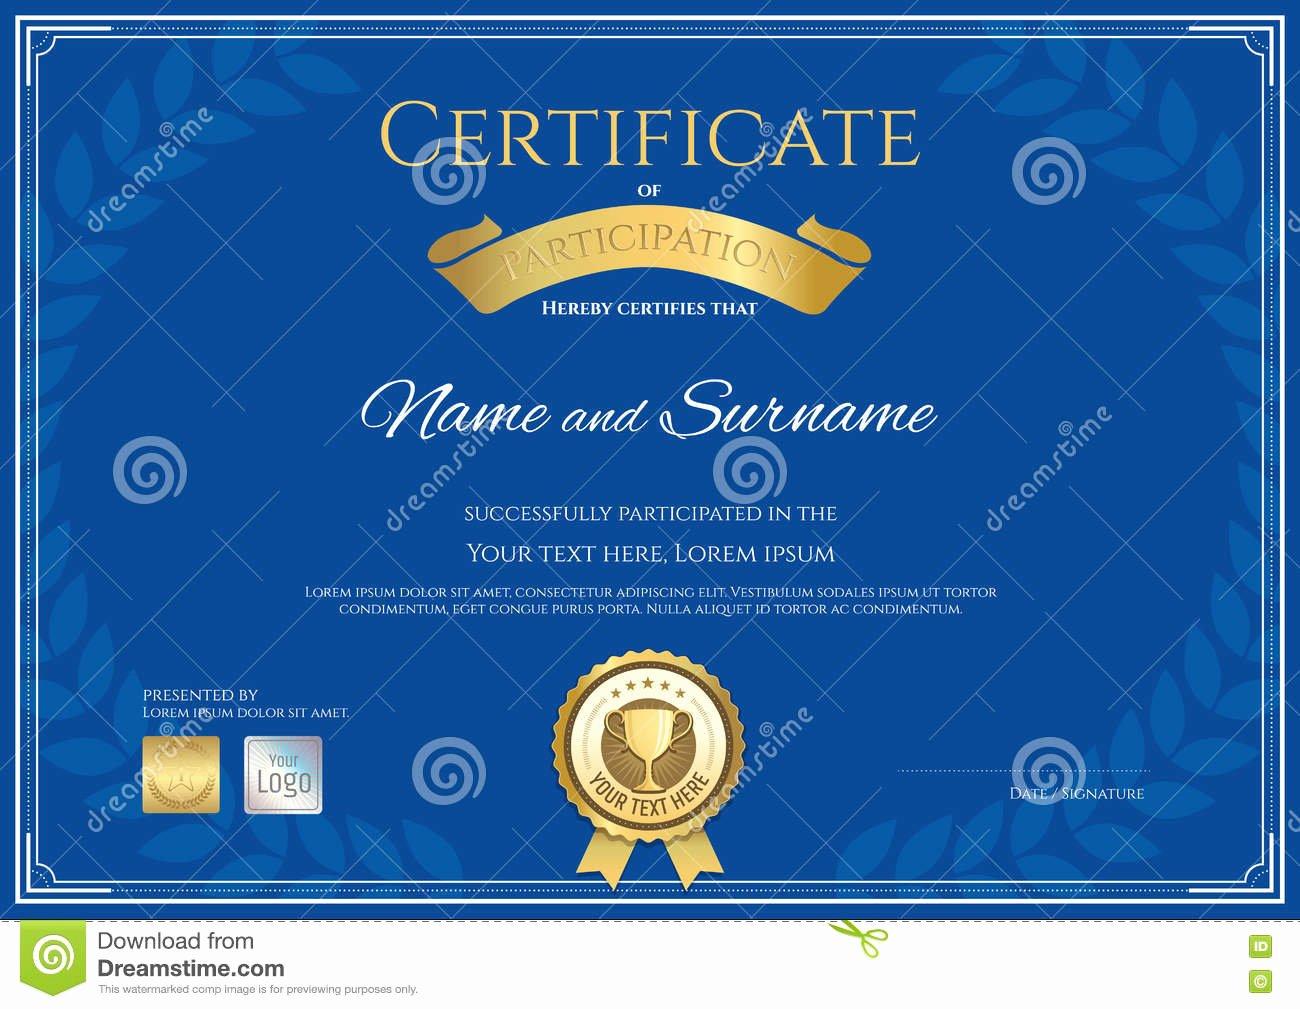 Dealer Participation Certification form New Certificate Participation Template In Gold Color Vector